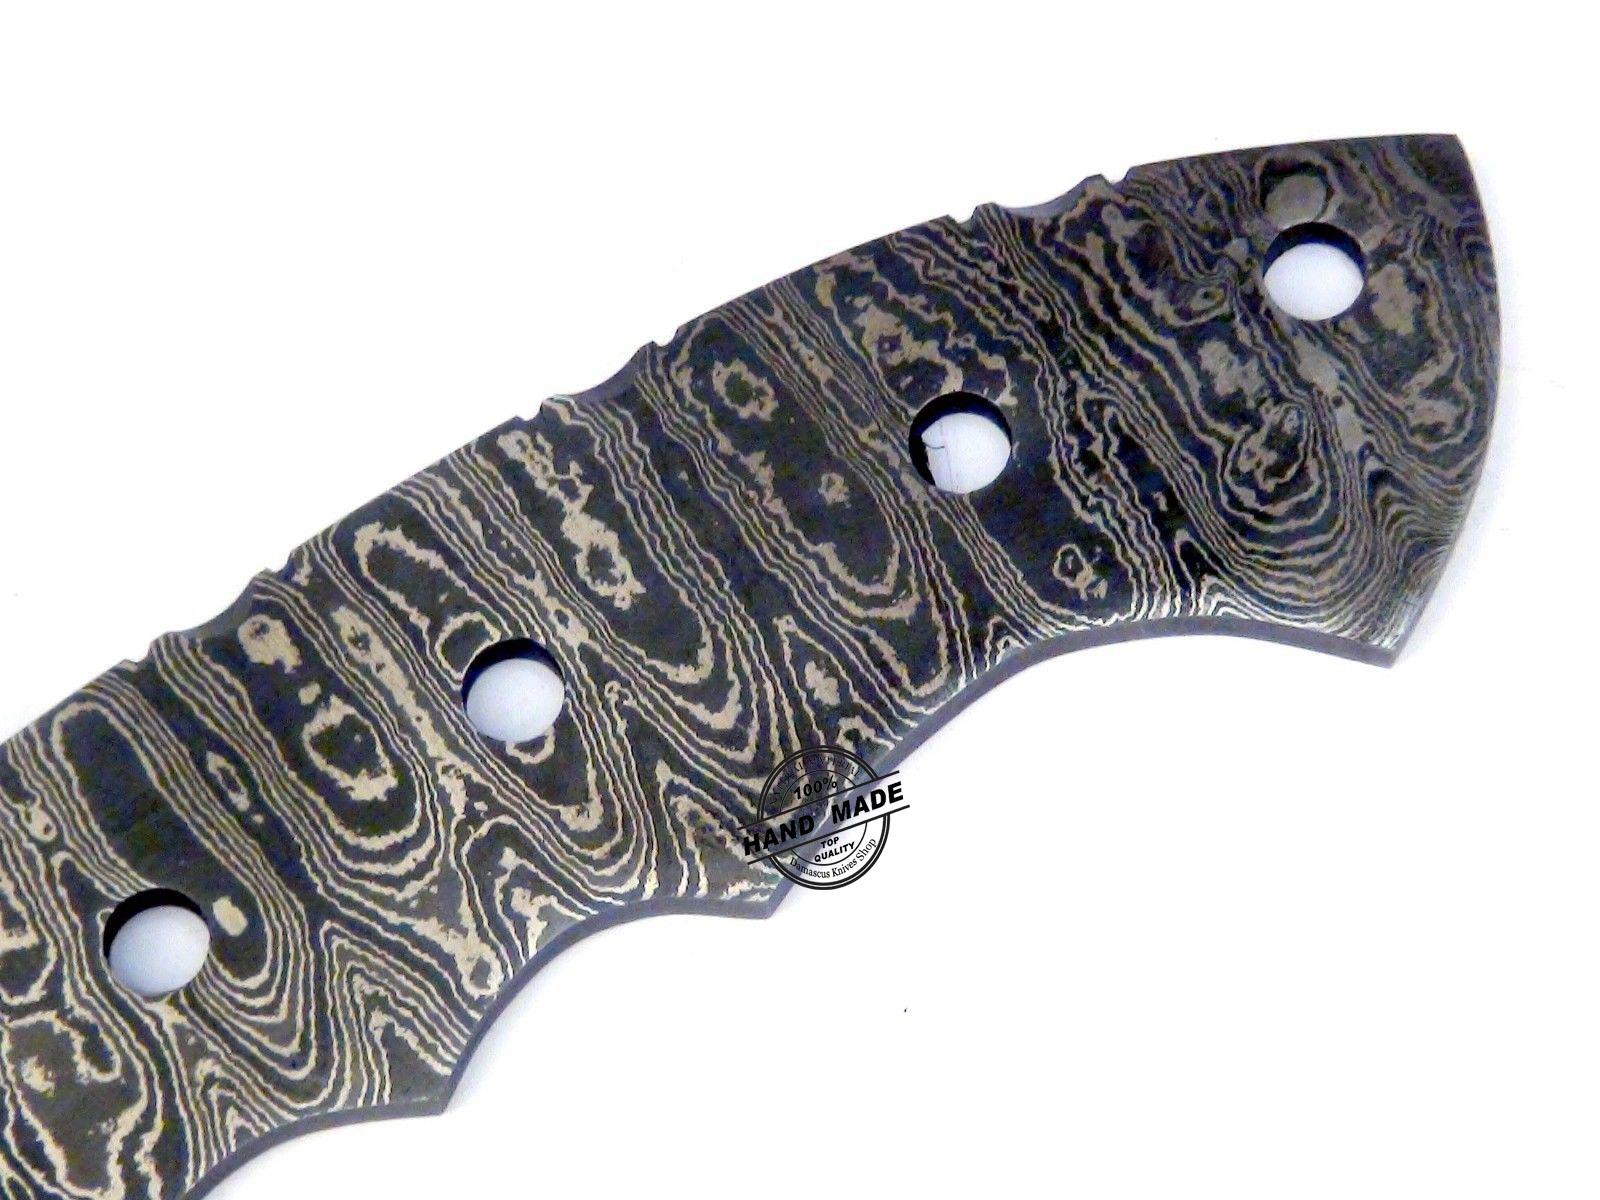 Blank Blade Damascus Tracker Knife